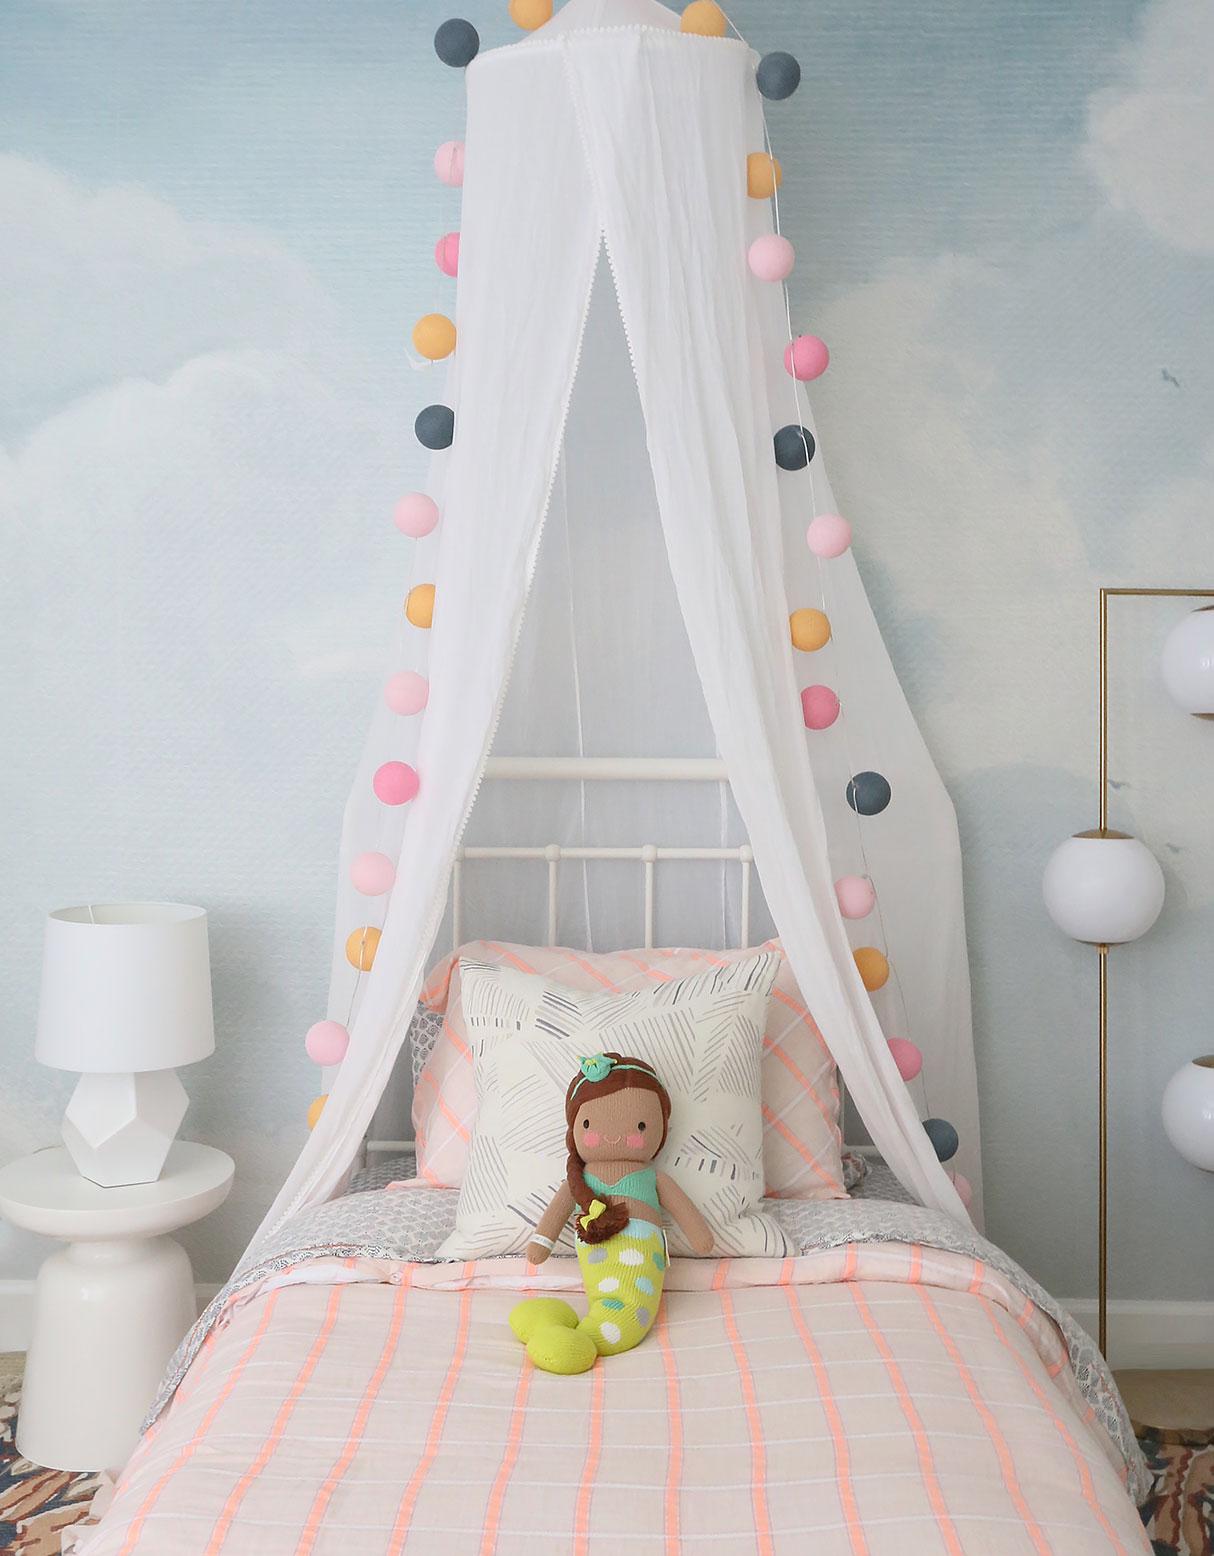 zora-bedroom-8-blog.jpg